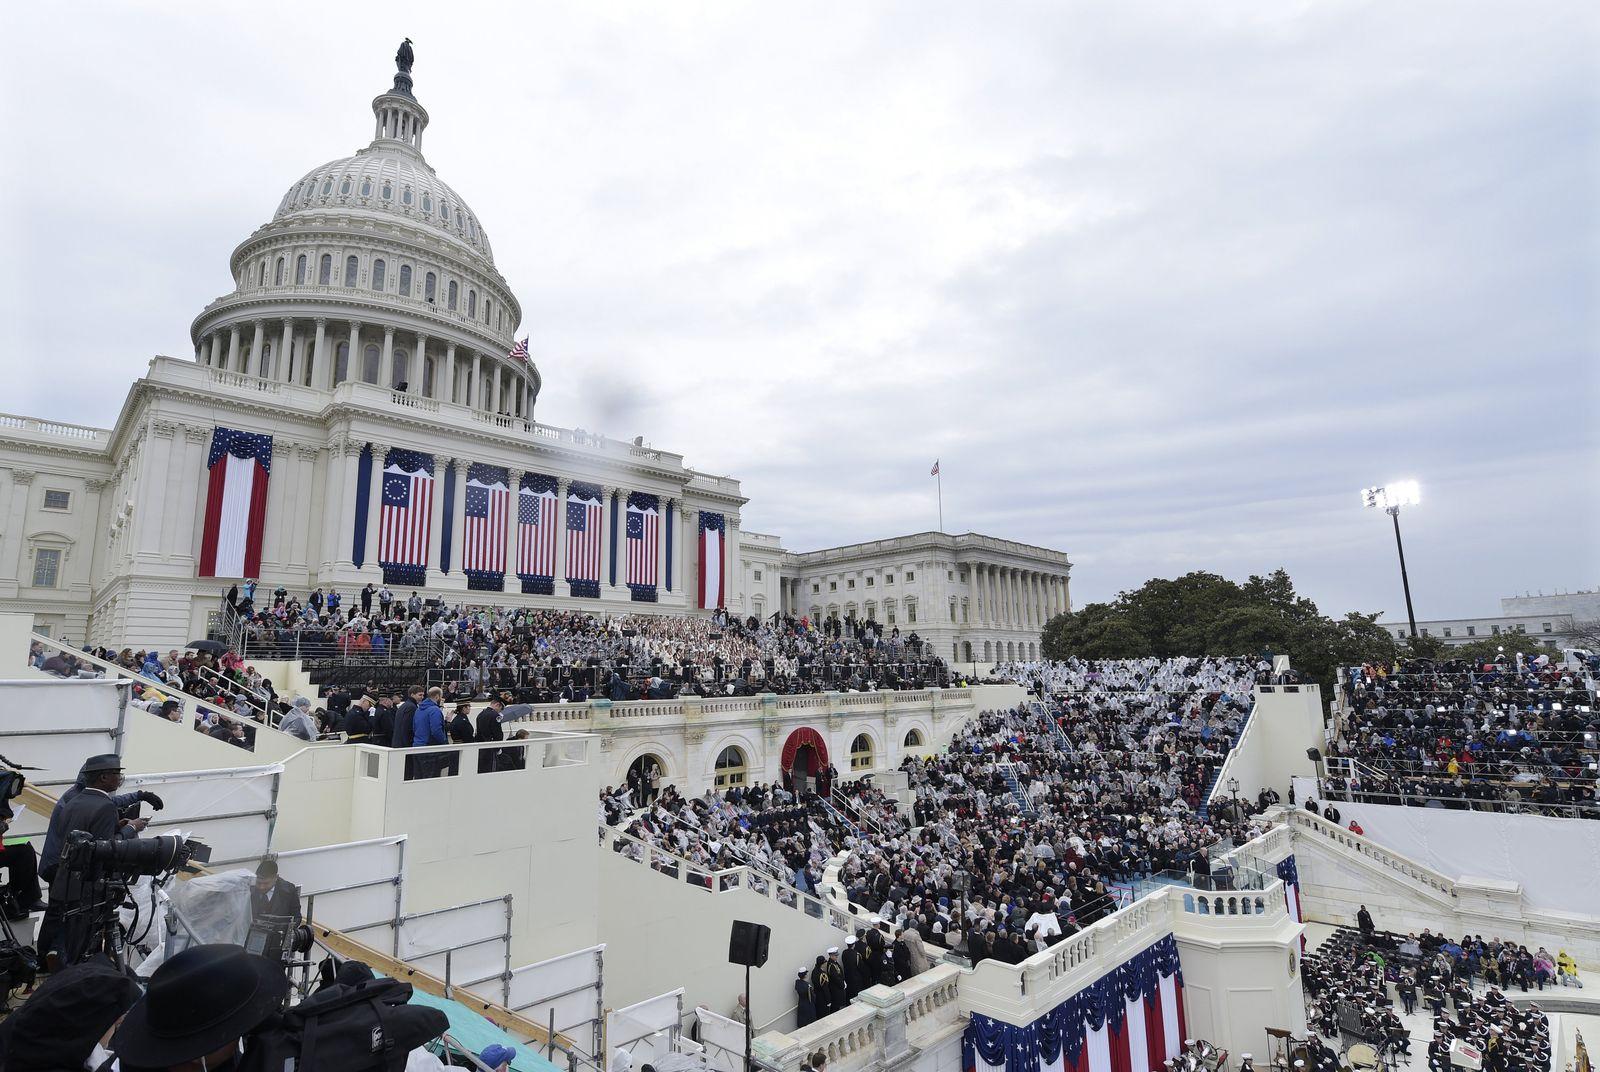 Trump Capitol/ Vereidigung/ inaugural